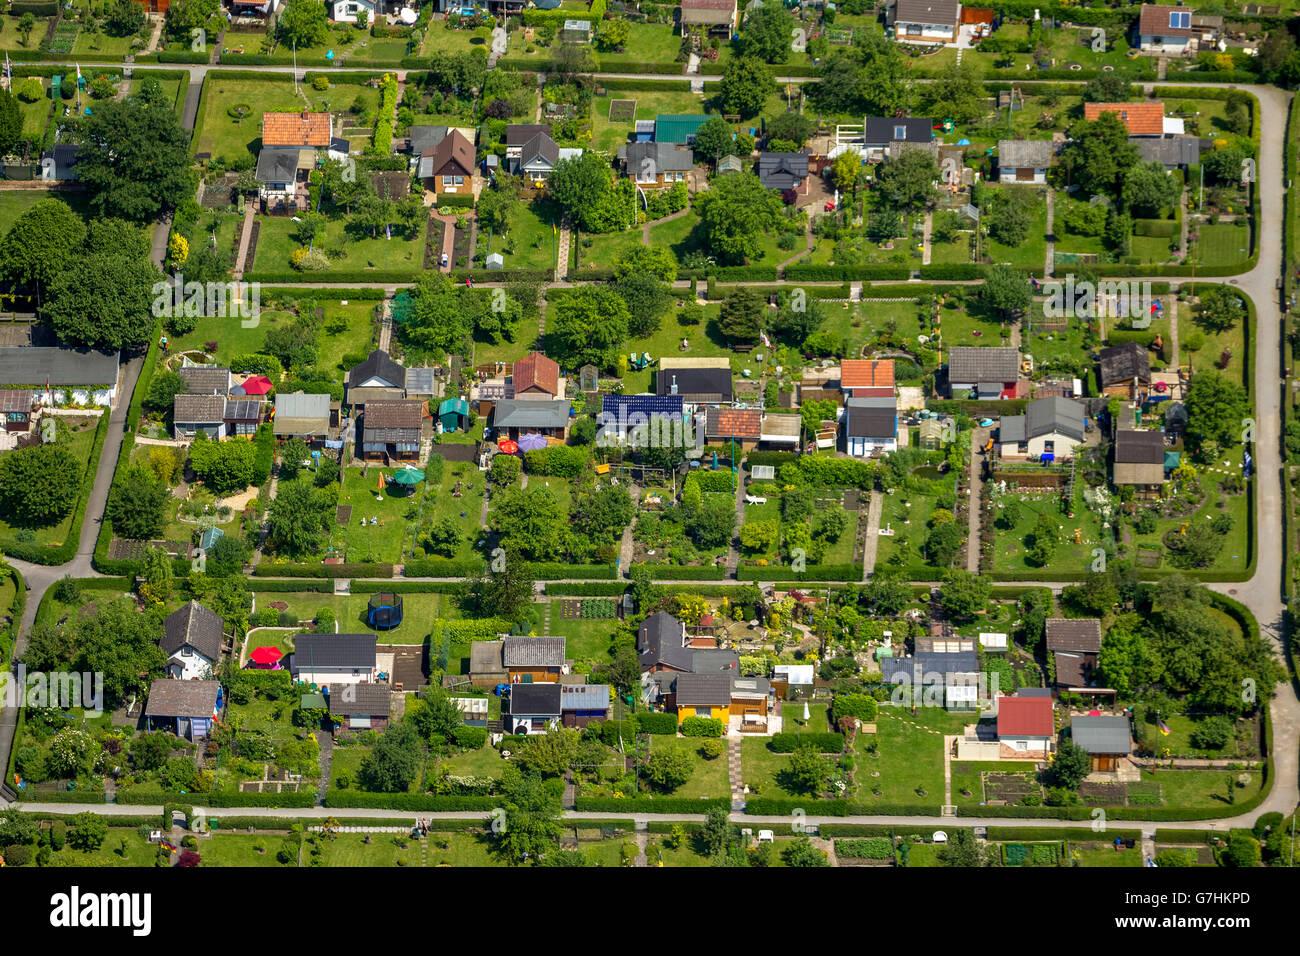 Aerial view, Kleingartenanlage Lütge Heide Bochum-Werne, allotments, allotment association, Bochum, Ruhr area, - Stock Image